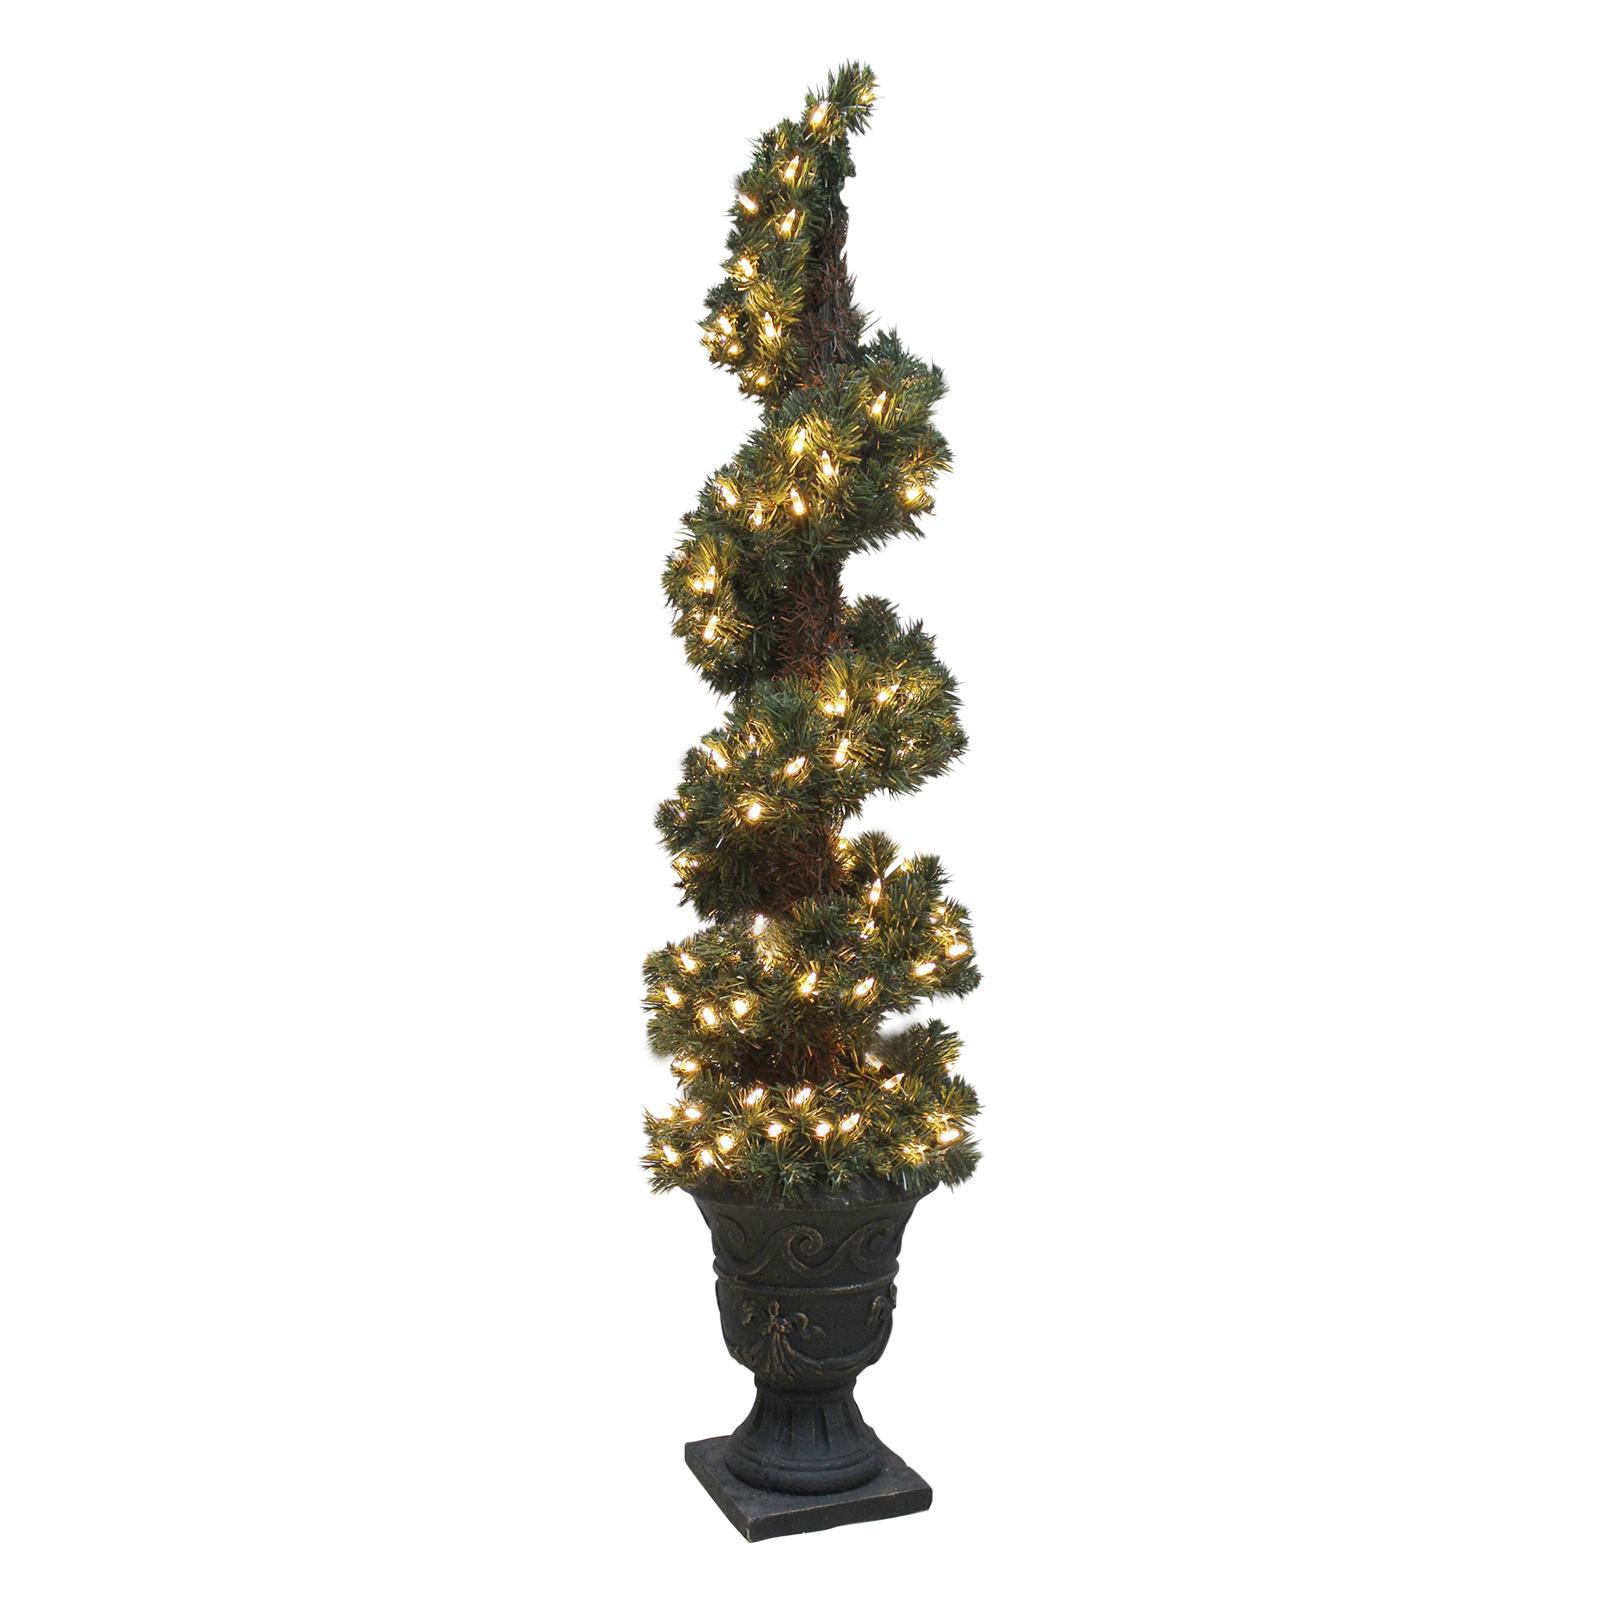 Christmas Tree Indoor Lights: Pre-Lit Artificial Spiral Shaped Christmas Tree Indoor